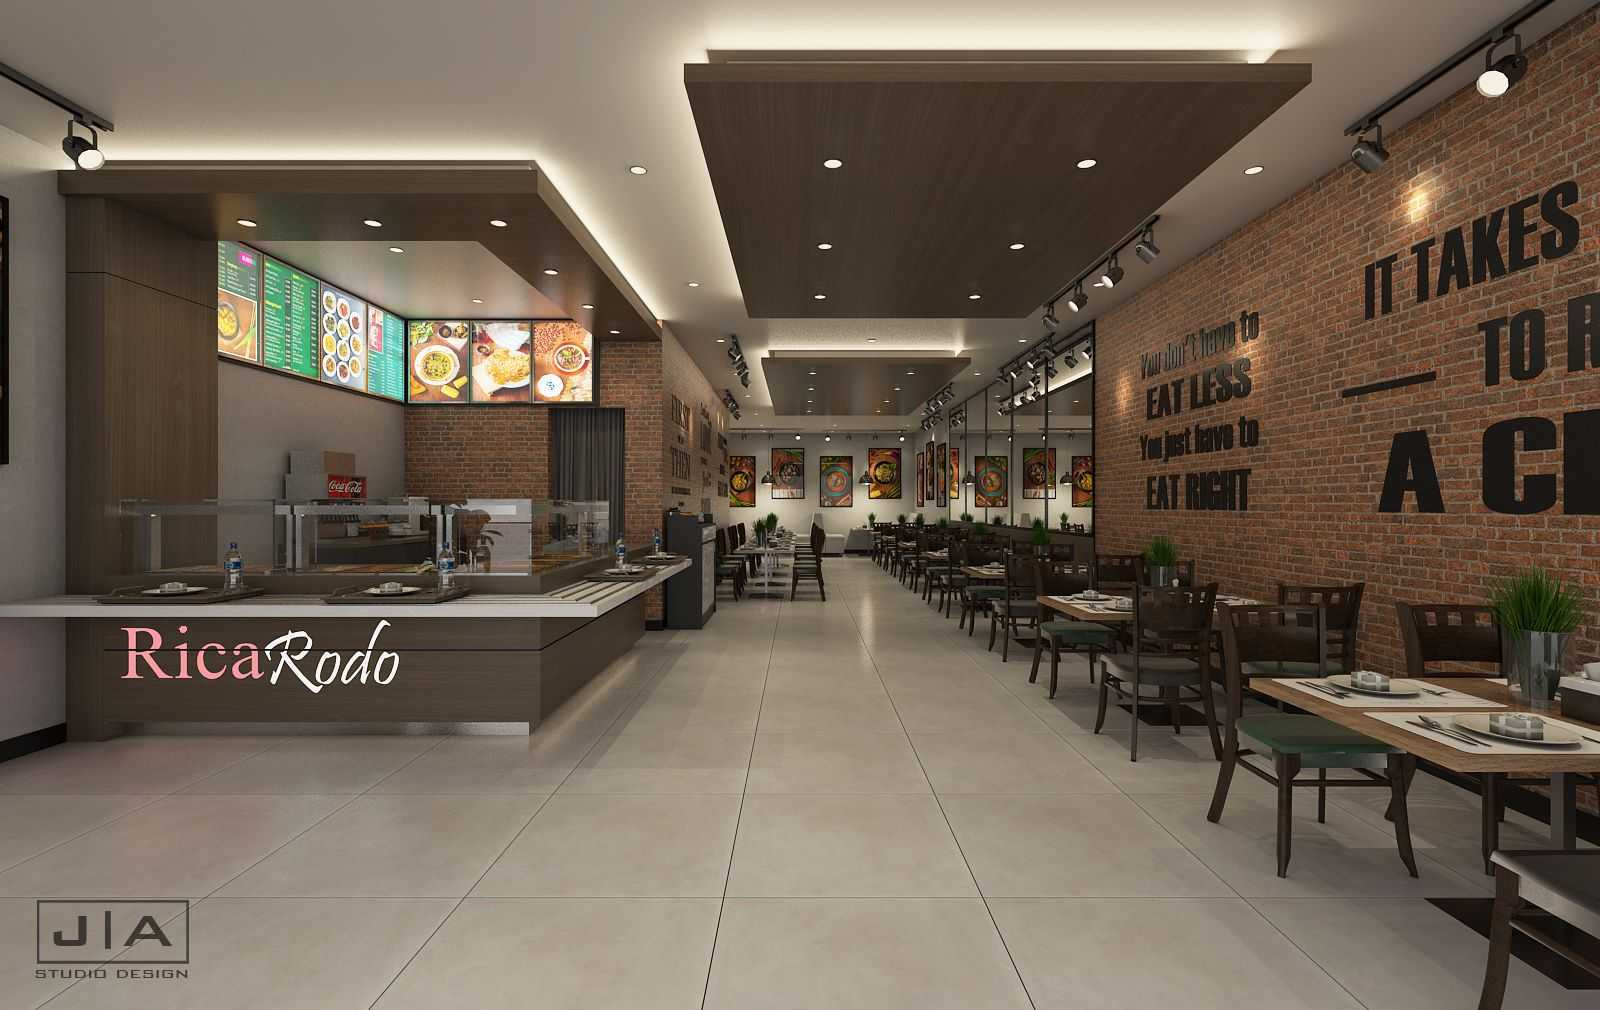 Juanda Sahputra Ricarodo Restaurant Jl. Pluit Karang Ayu Barat, Rt.15/rw.4, Pluit, Penjaringan, Kota Jkt Utara, Daerah Khusus Ibukota Jakarta 14450, Indonesia Jl. Pluit Karang Ayu Barat, Rt.15/rw.4, Pluit, Penjaringan, Kota Jkt Utara, Daerah Khusus Ibukota Jakarta 14450, Indonesia Juanda-Sahputra-Ricarodo-Restaurant   58376